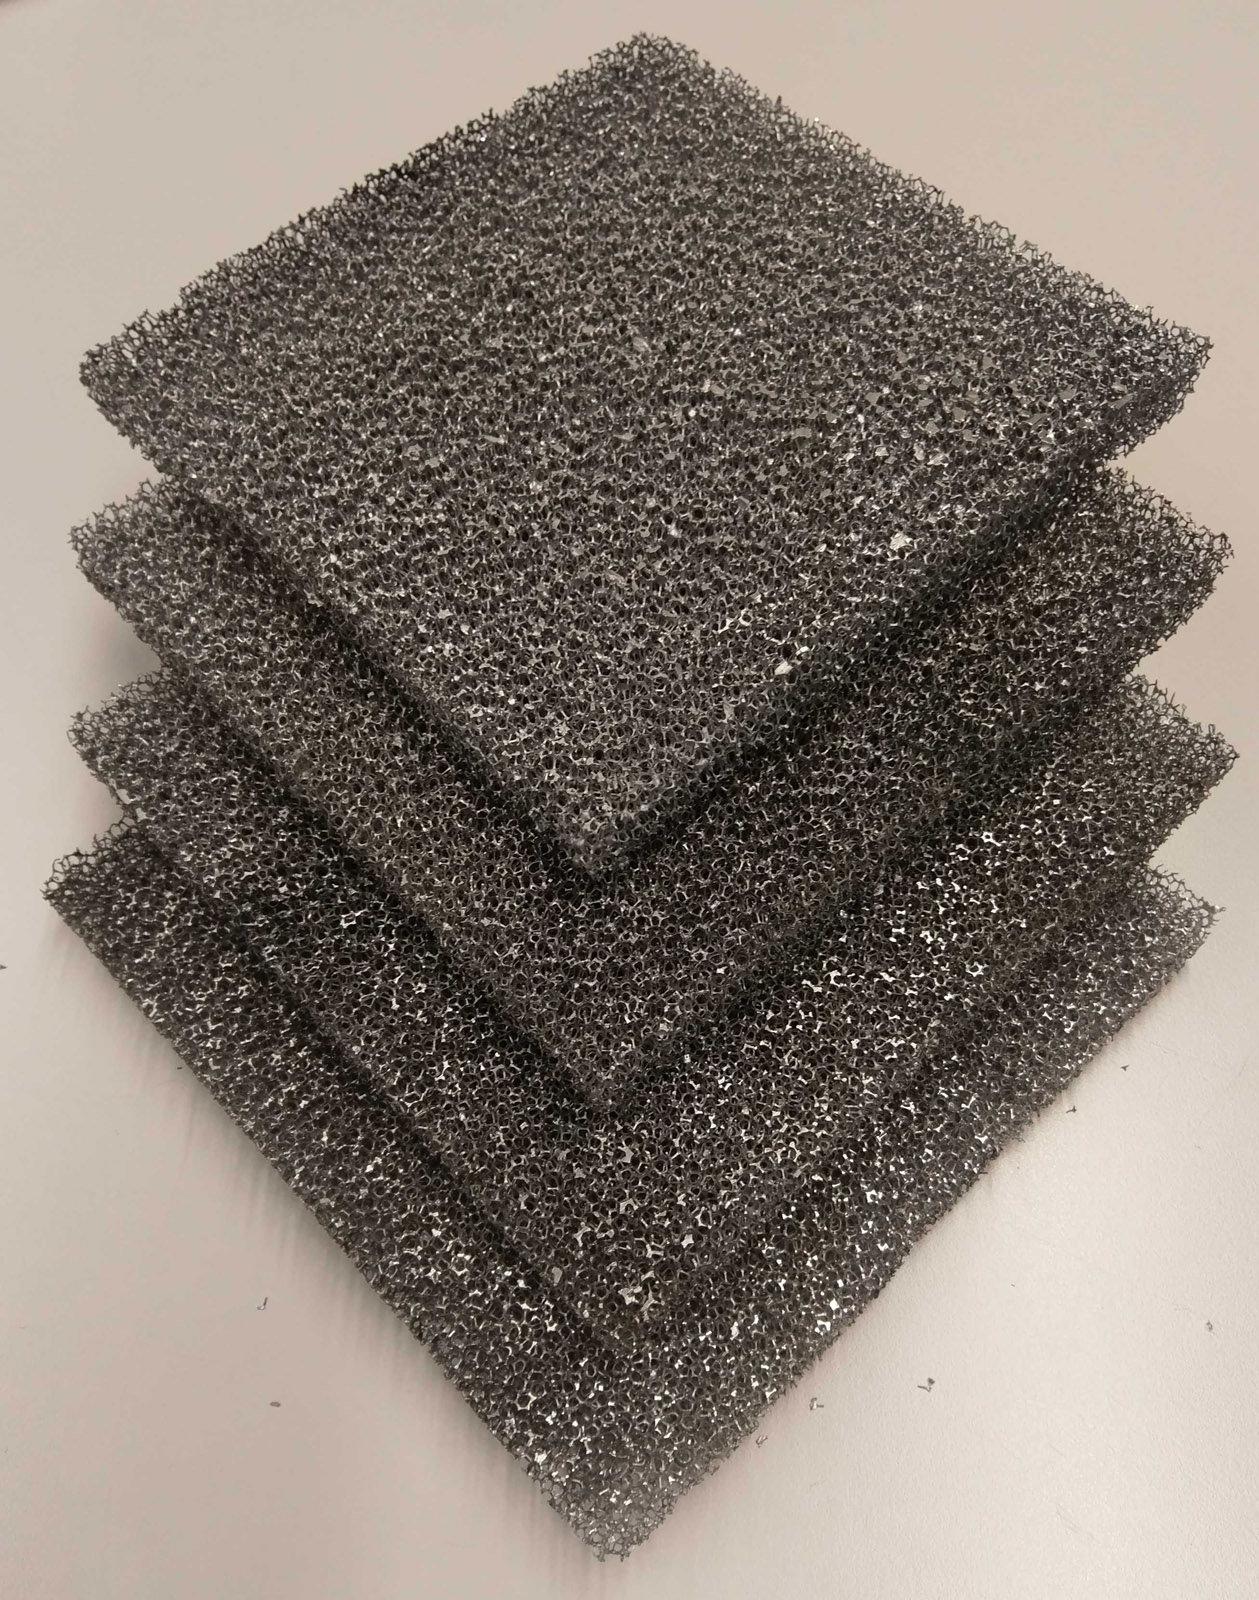 Metal sponge plates. & New wood-metal hybrid for lightweight construction